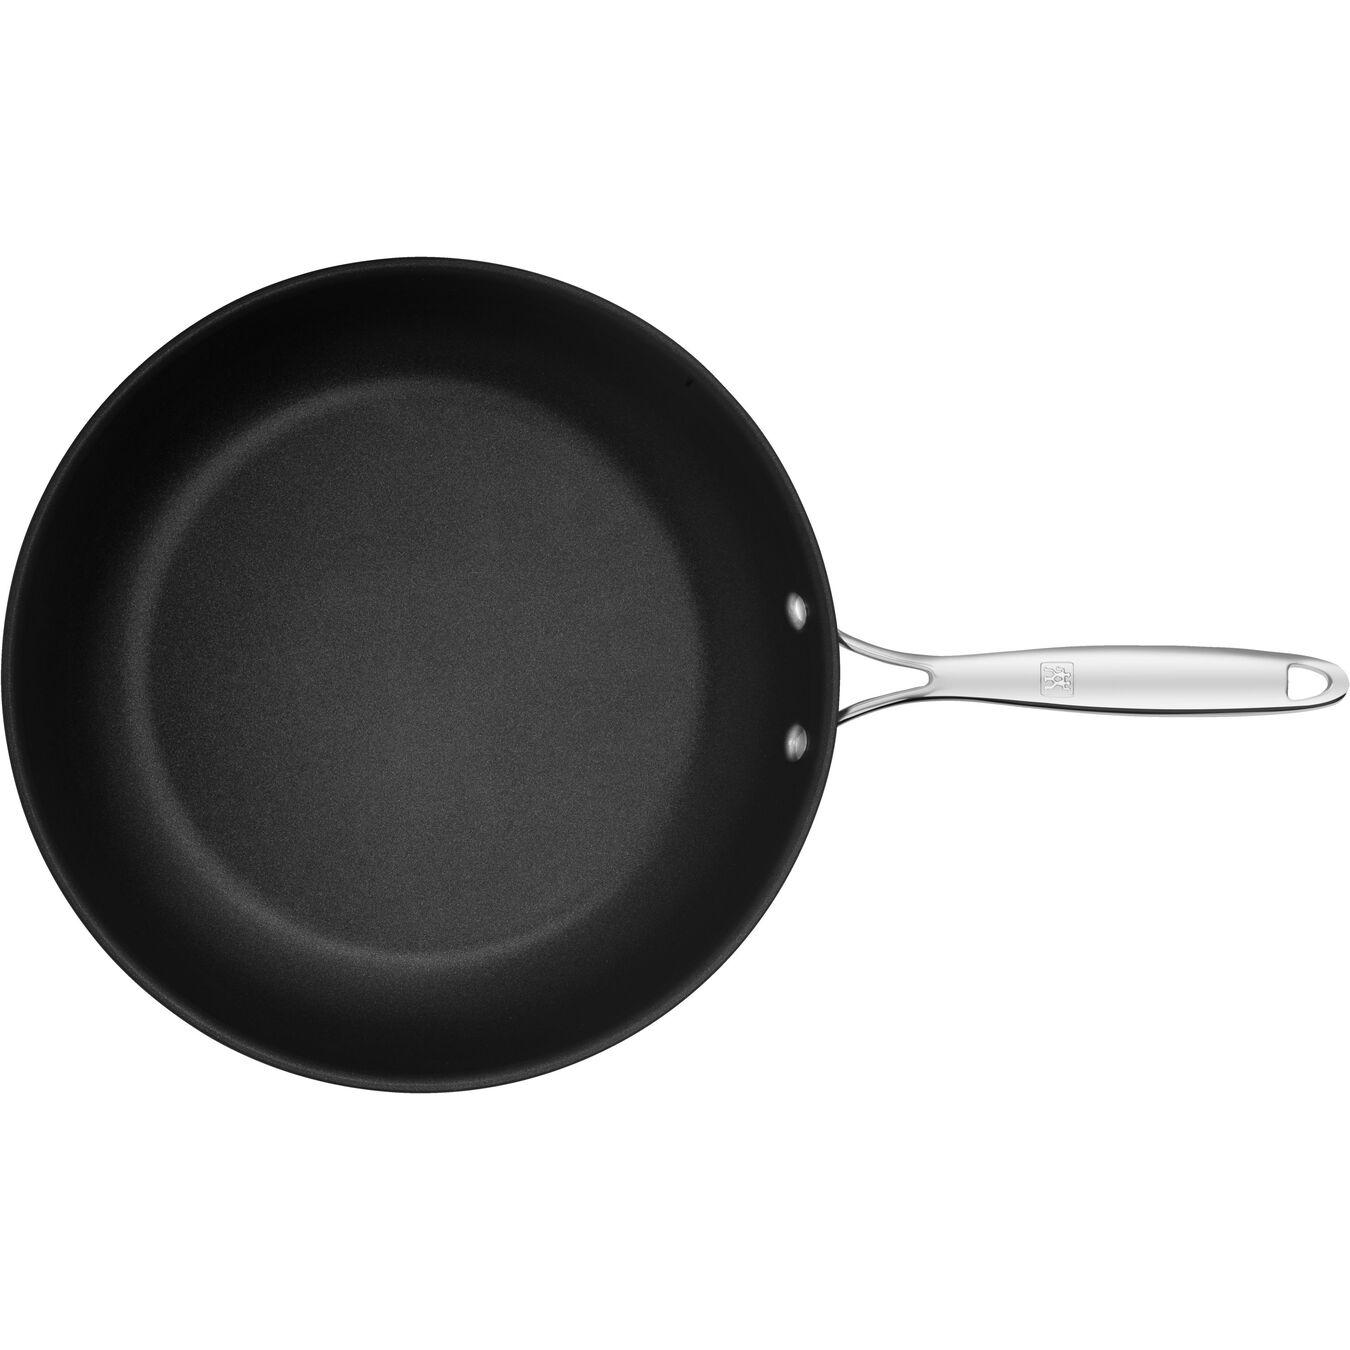 30 cm / 12 inch Aluminum Frying pan,,large 5